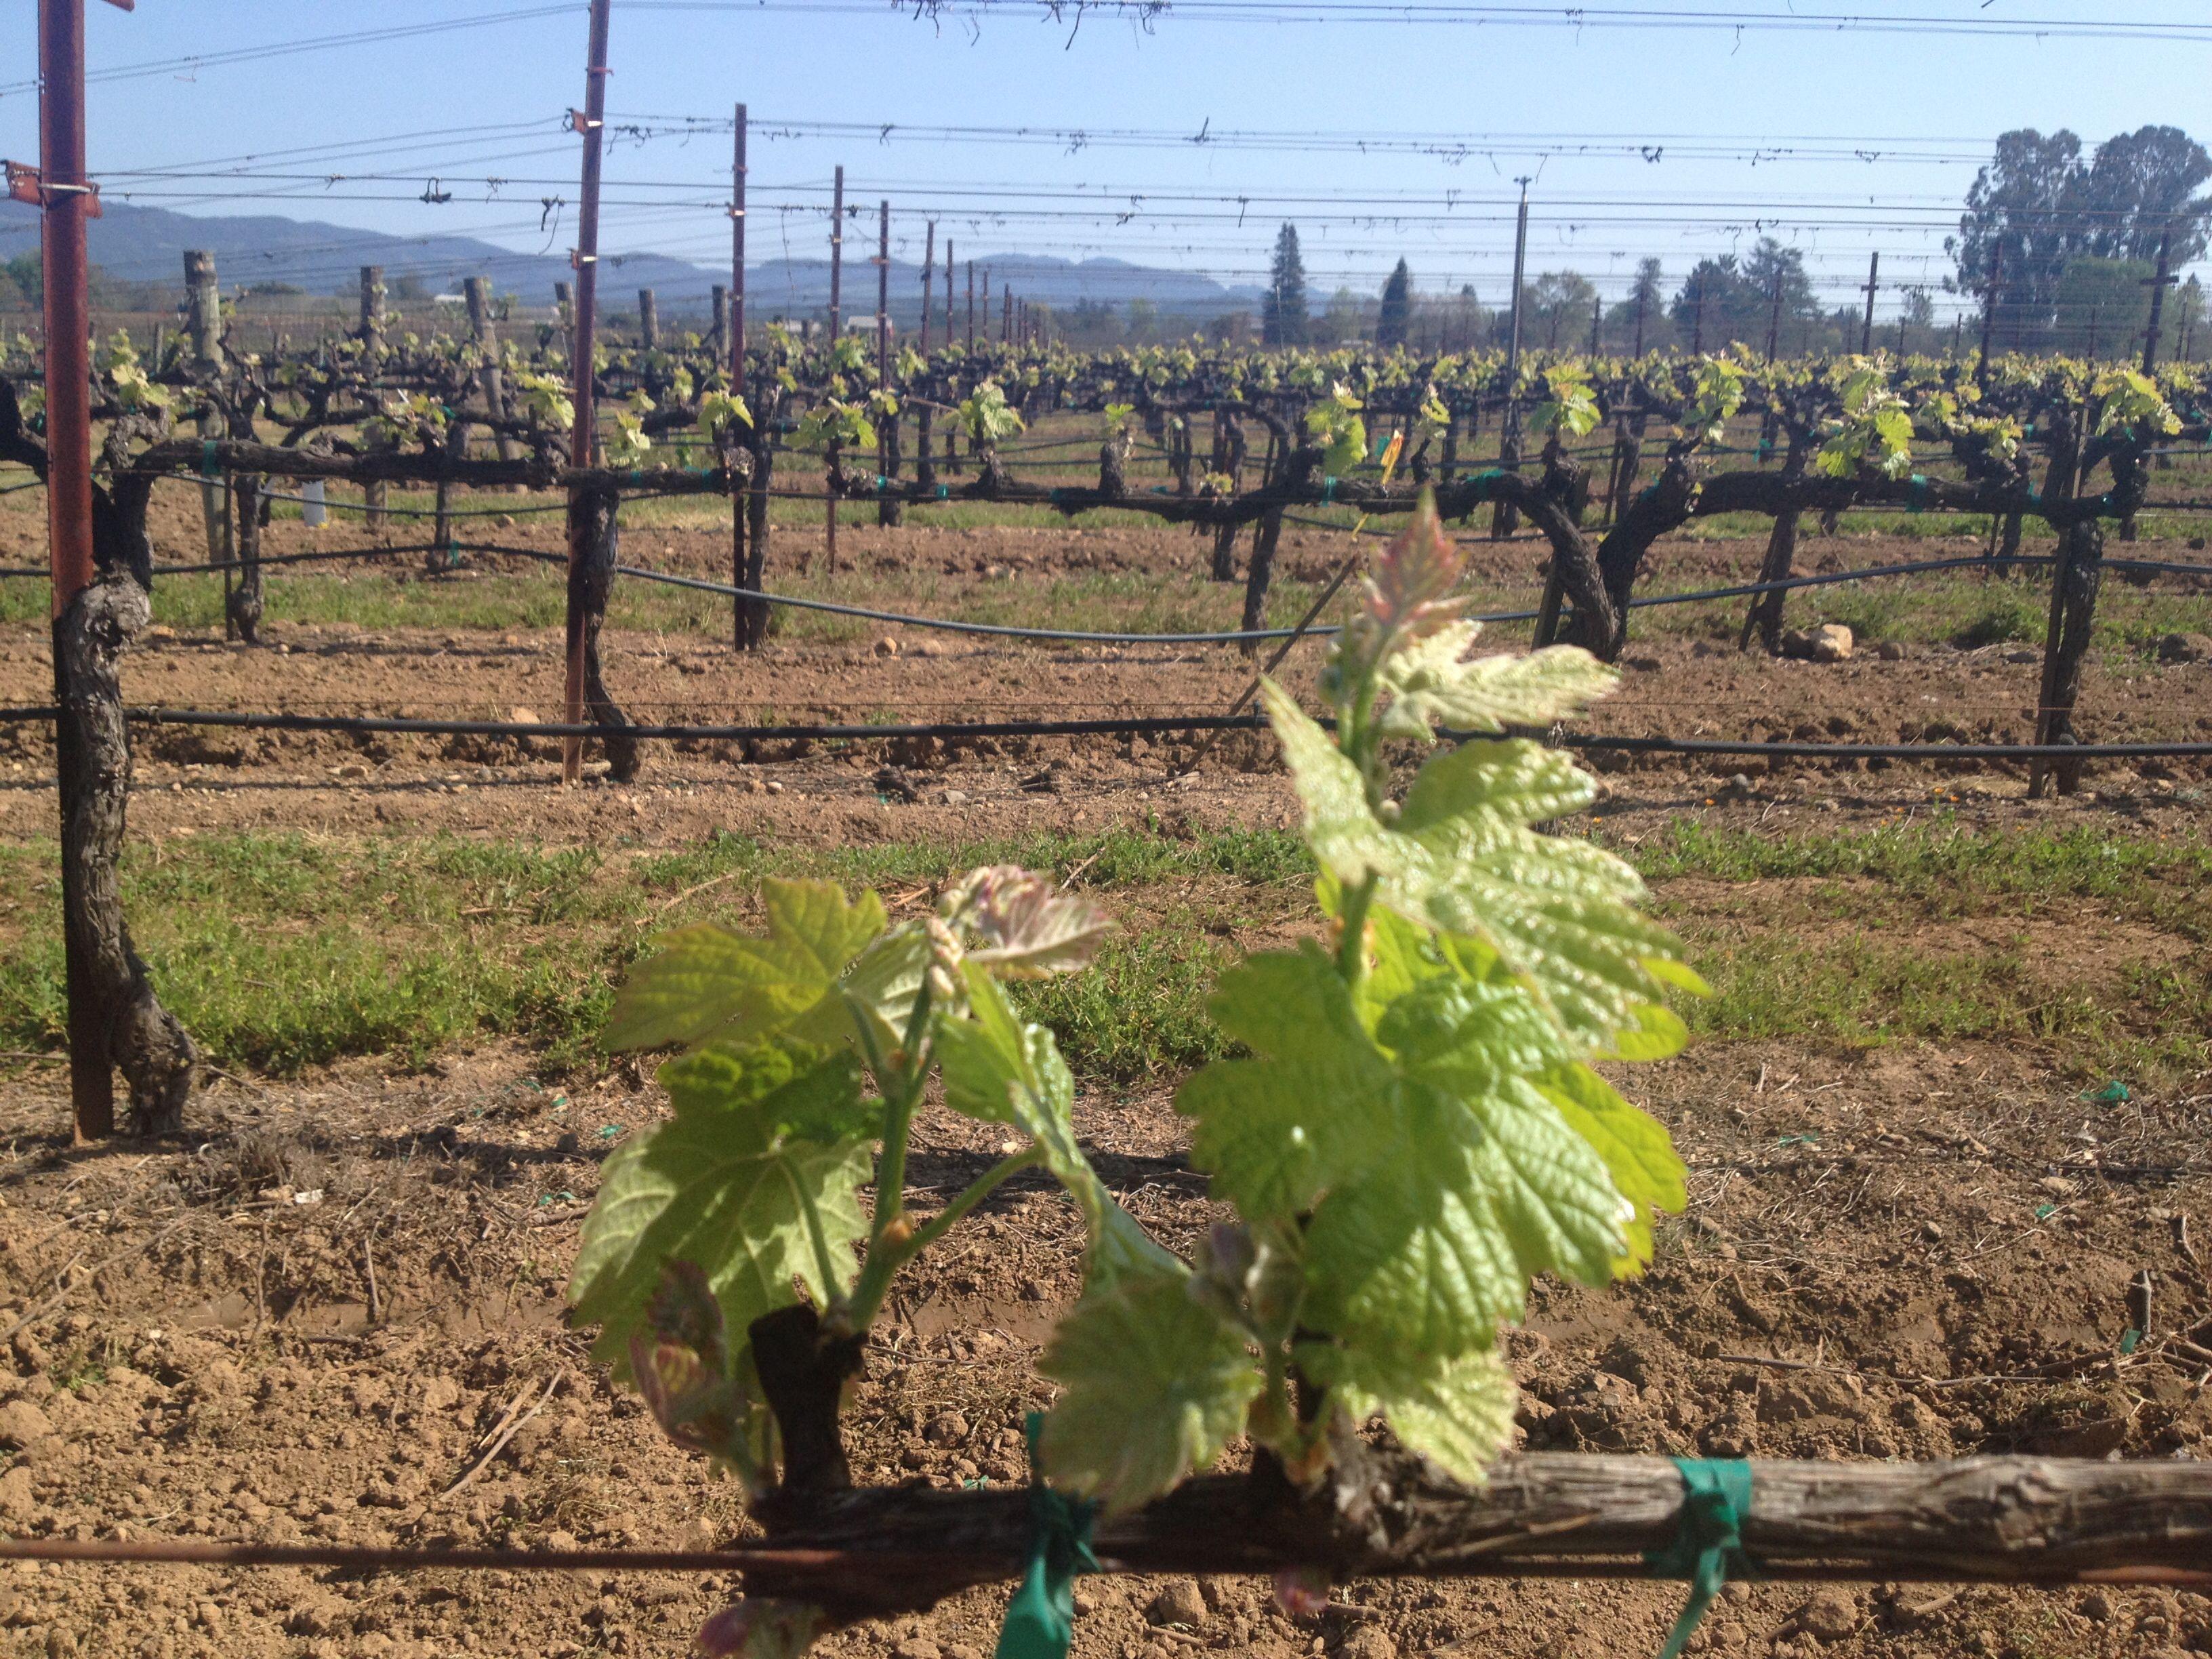 Andretti Vineyard in Napa Valley #california